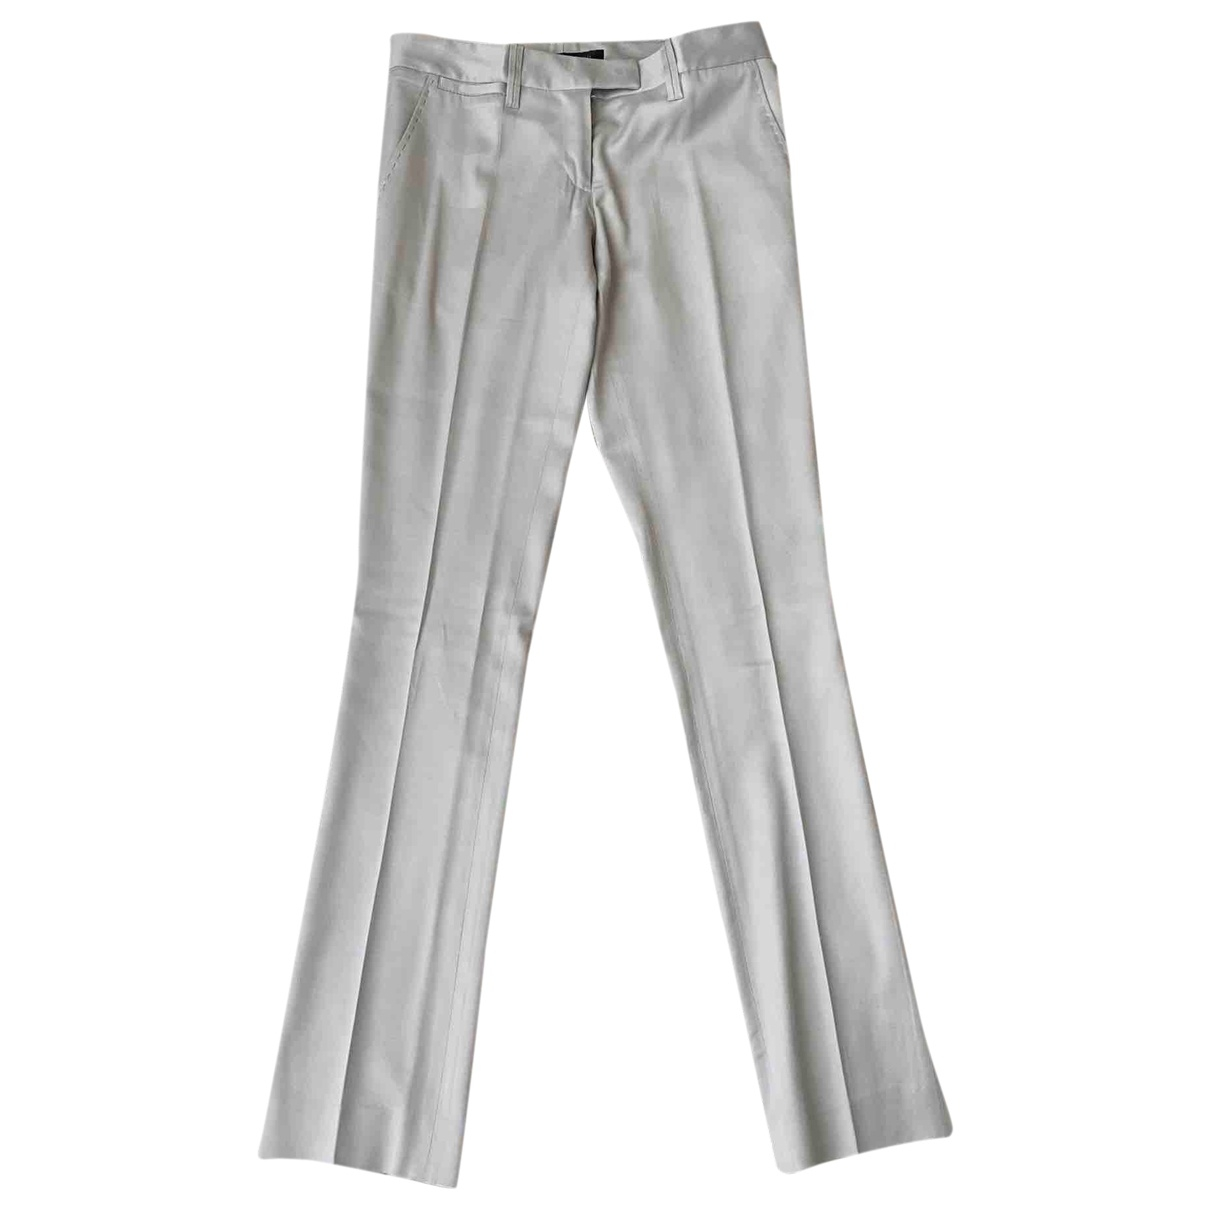 Barbara Bui \N Beige Trousers for Women 34 FR